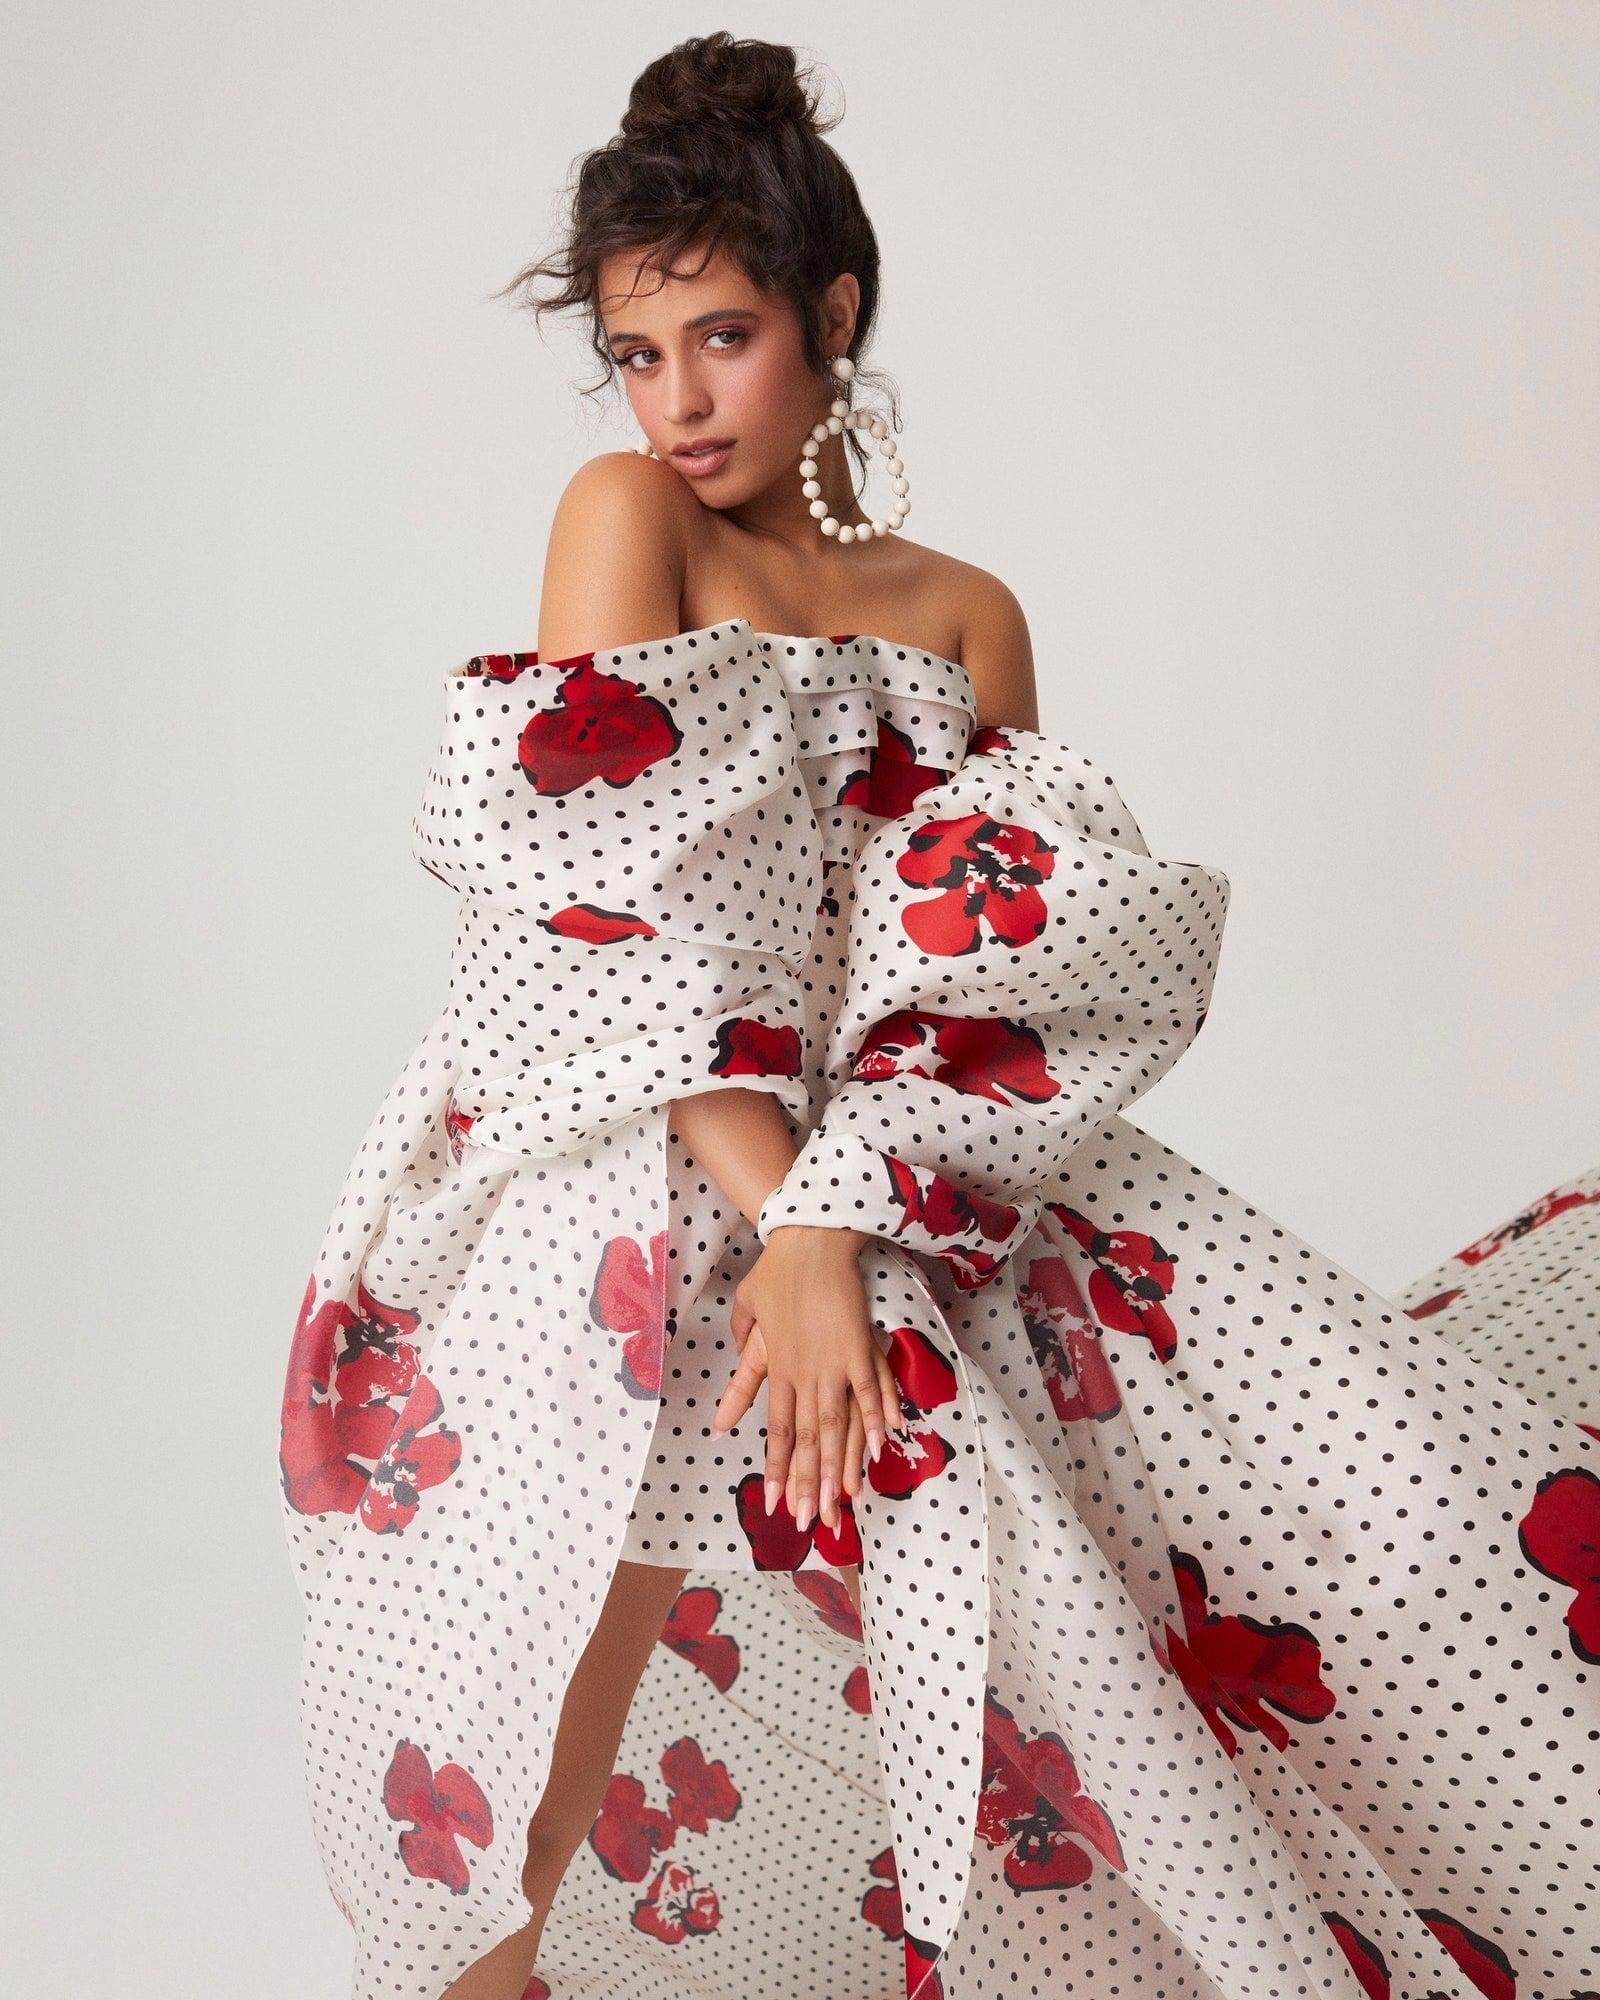 Camila Cabello Glamour 2021 14 min - Фото: Camila Cabello на обложке журнала Glamour